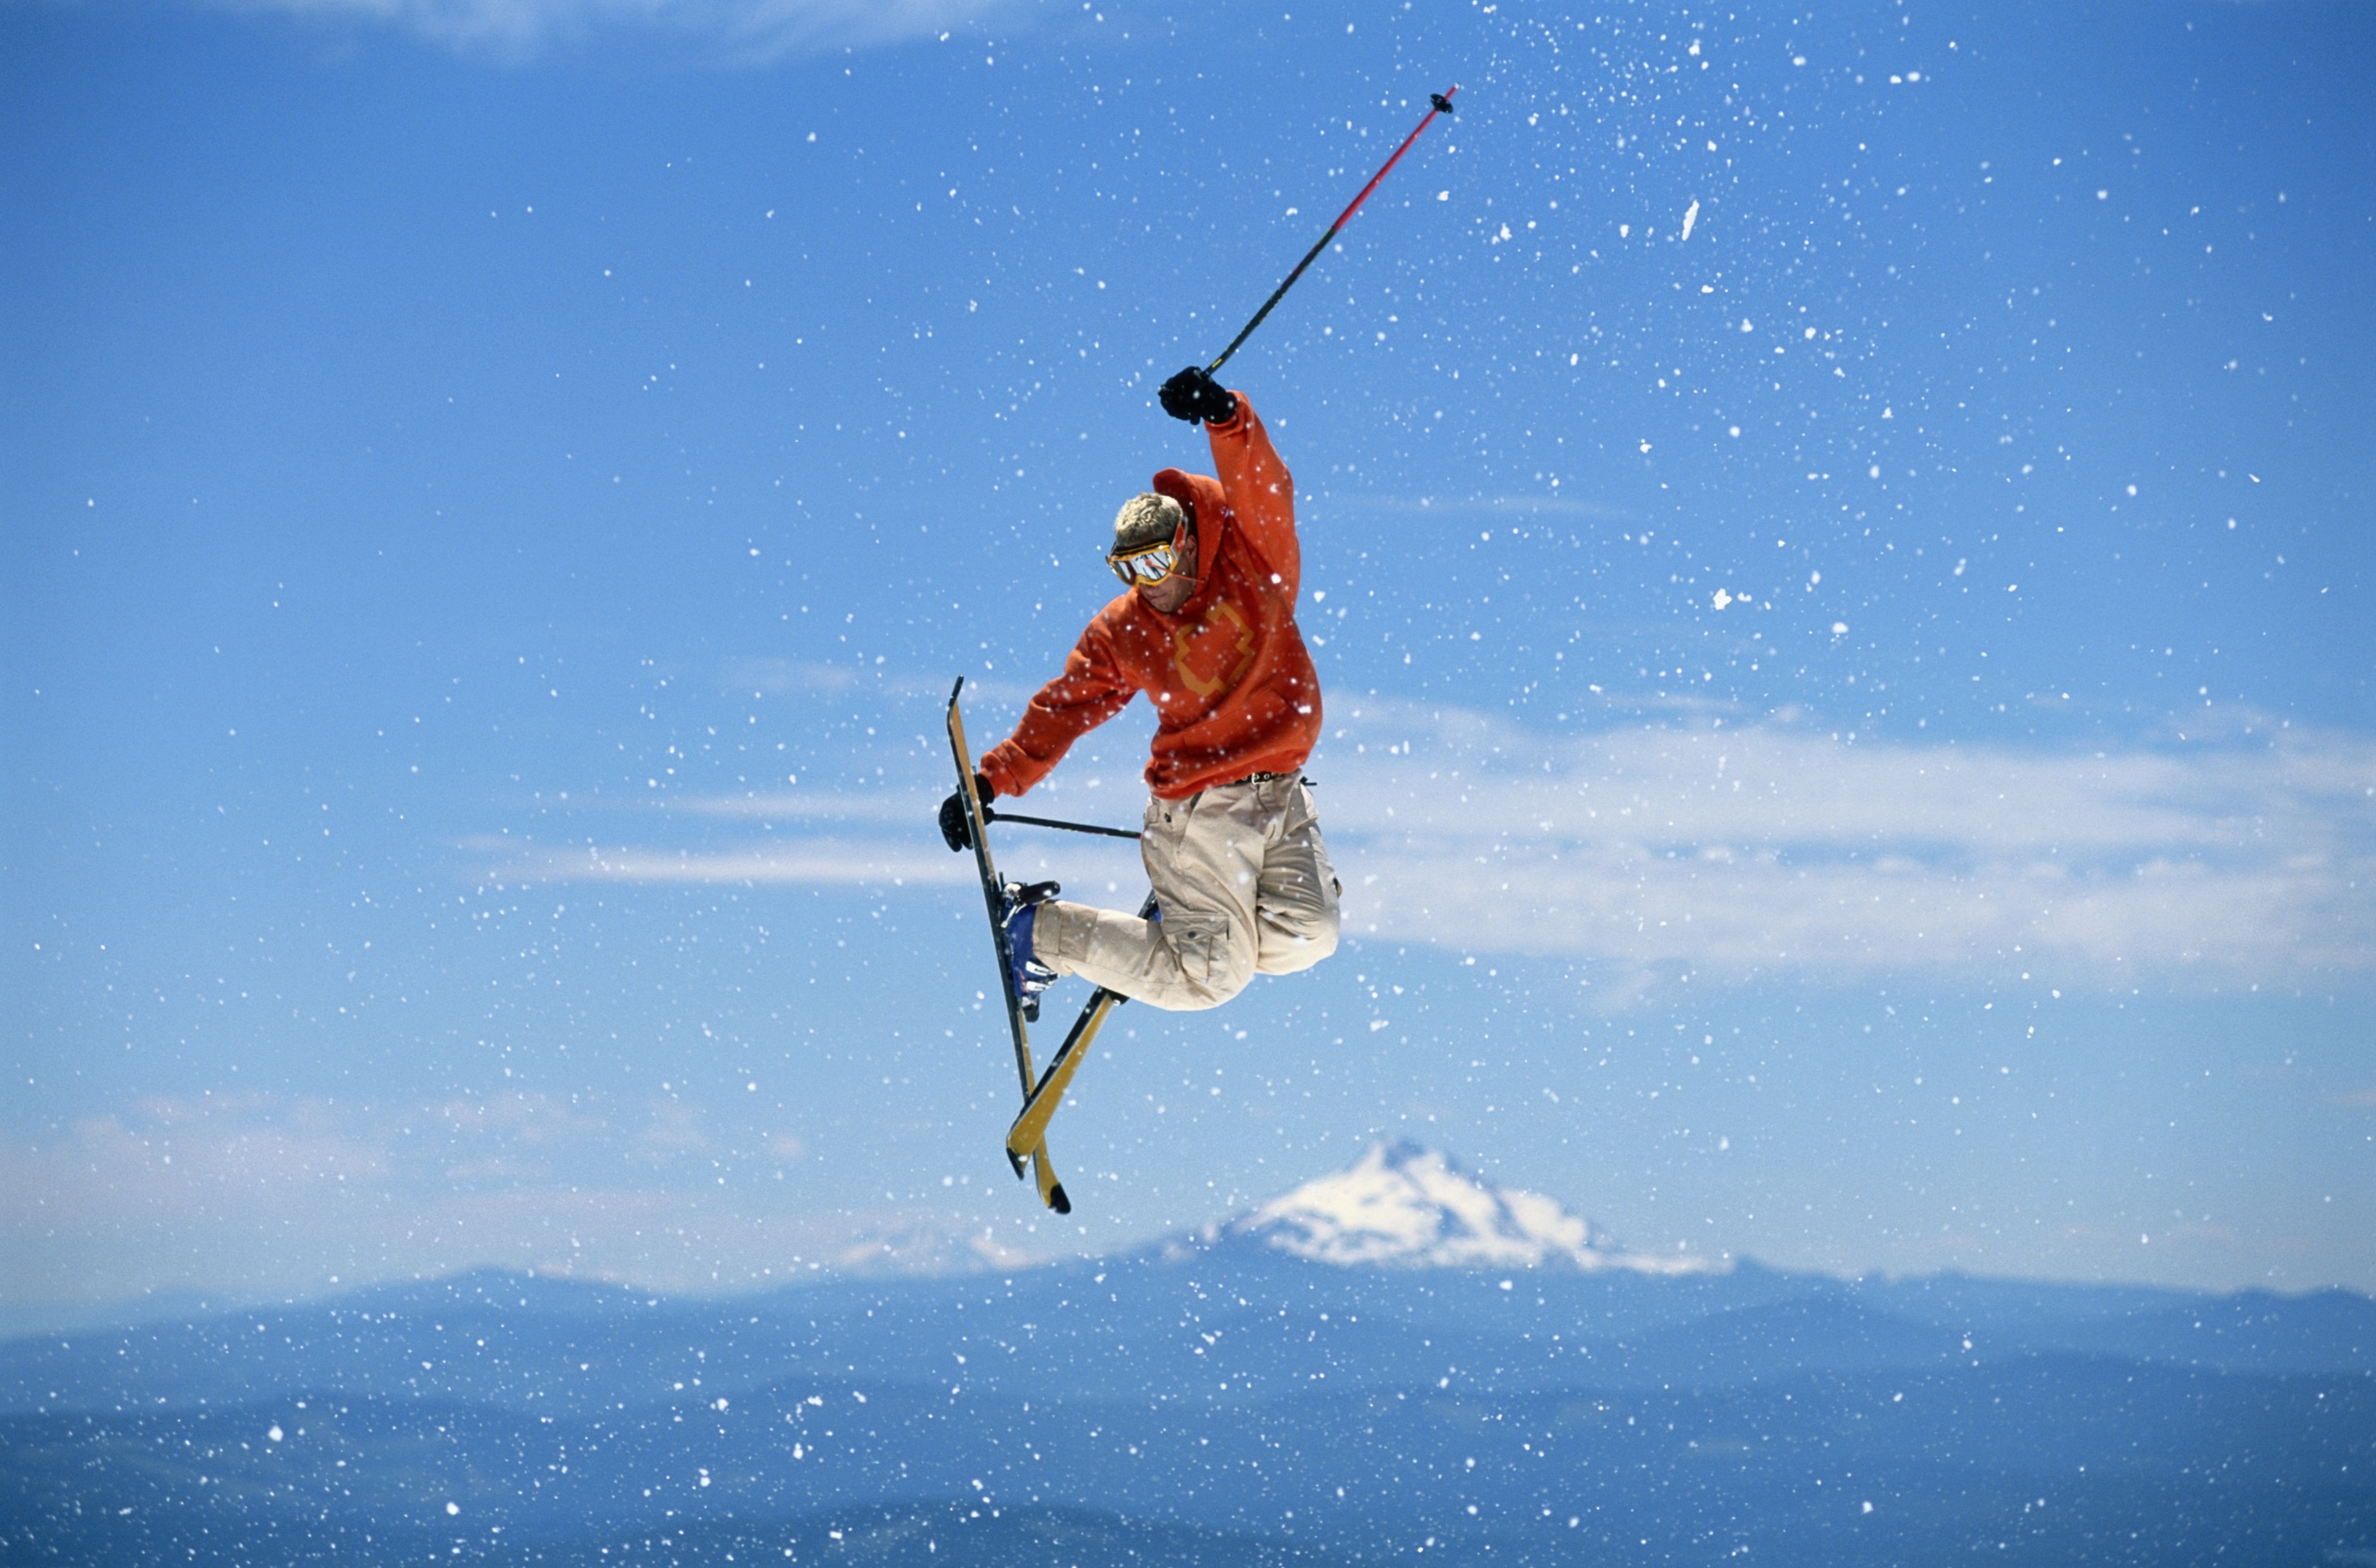 Mount Hood, Oregon, United States of America